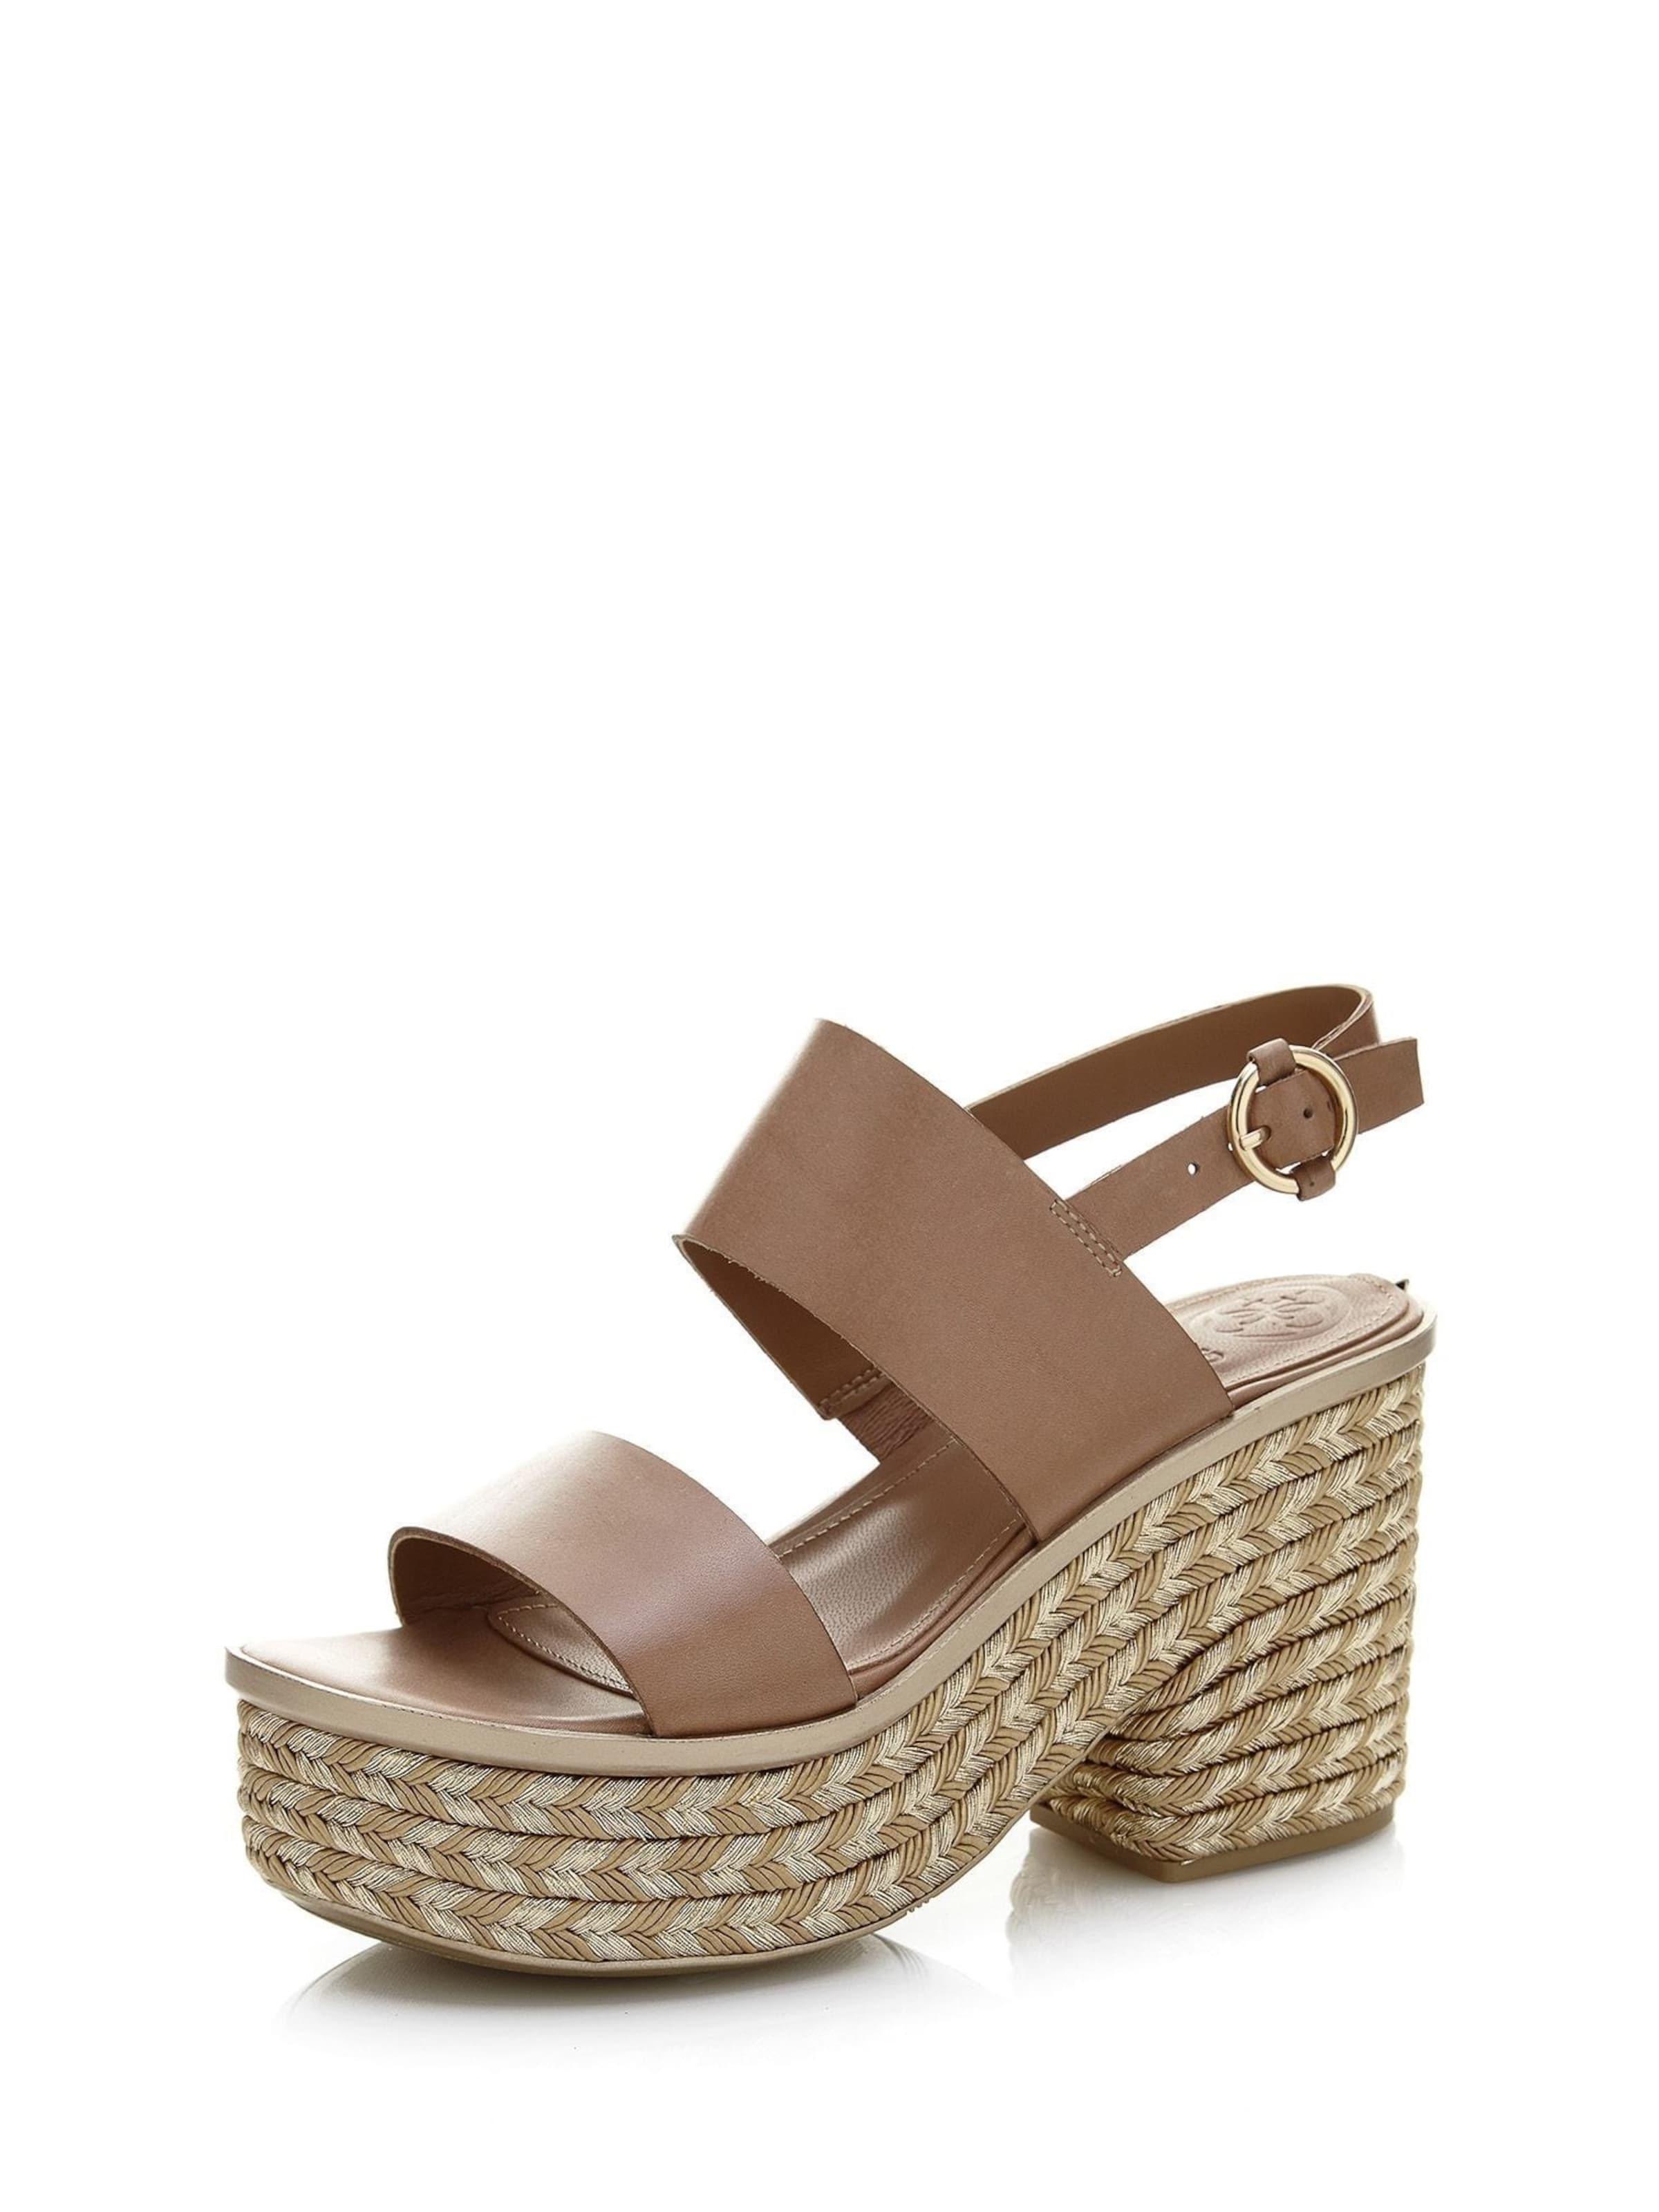 GUESS SANDALETTE NINETTA Verschleißfeste billige Schuhe